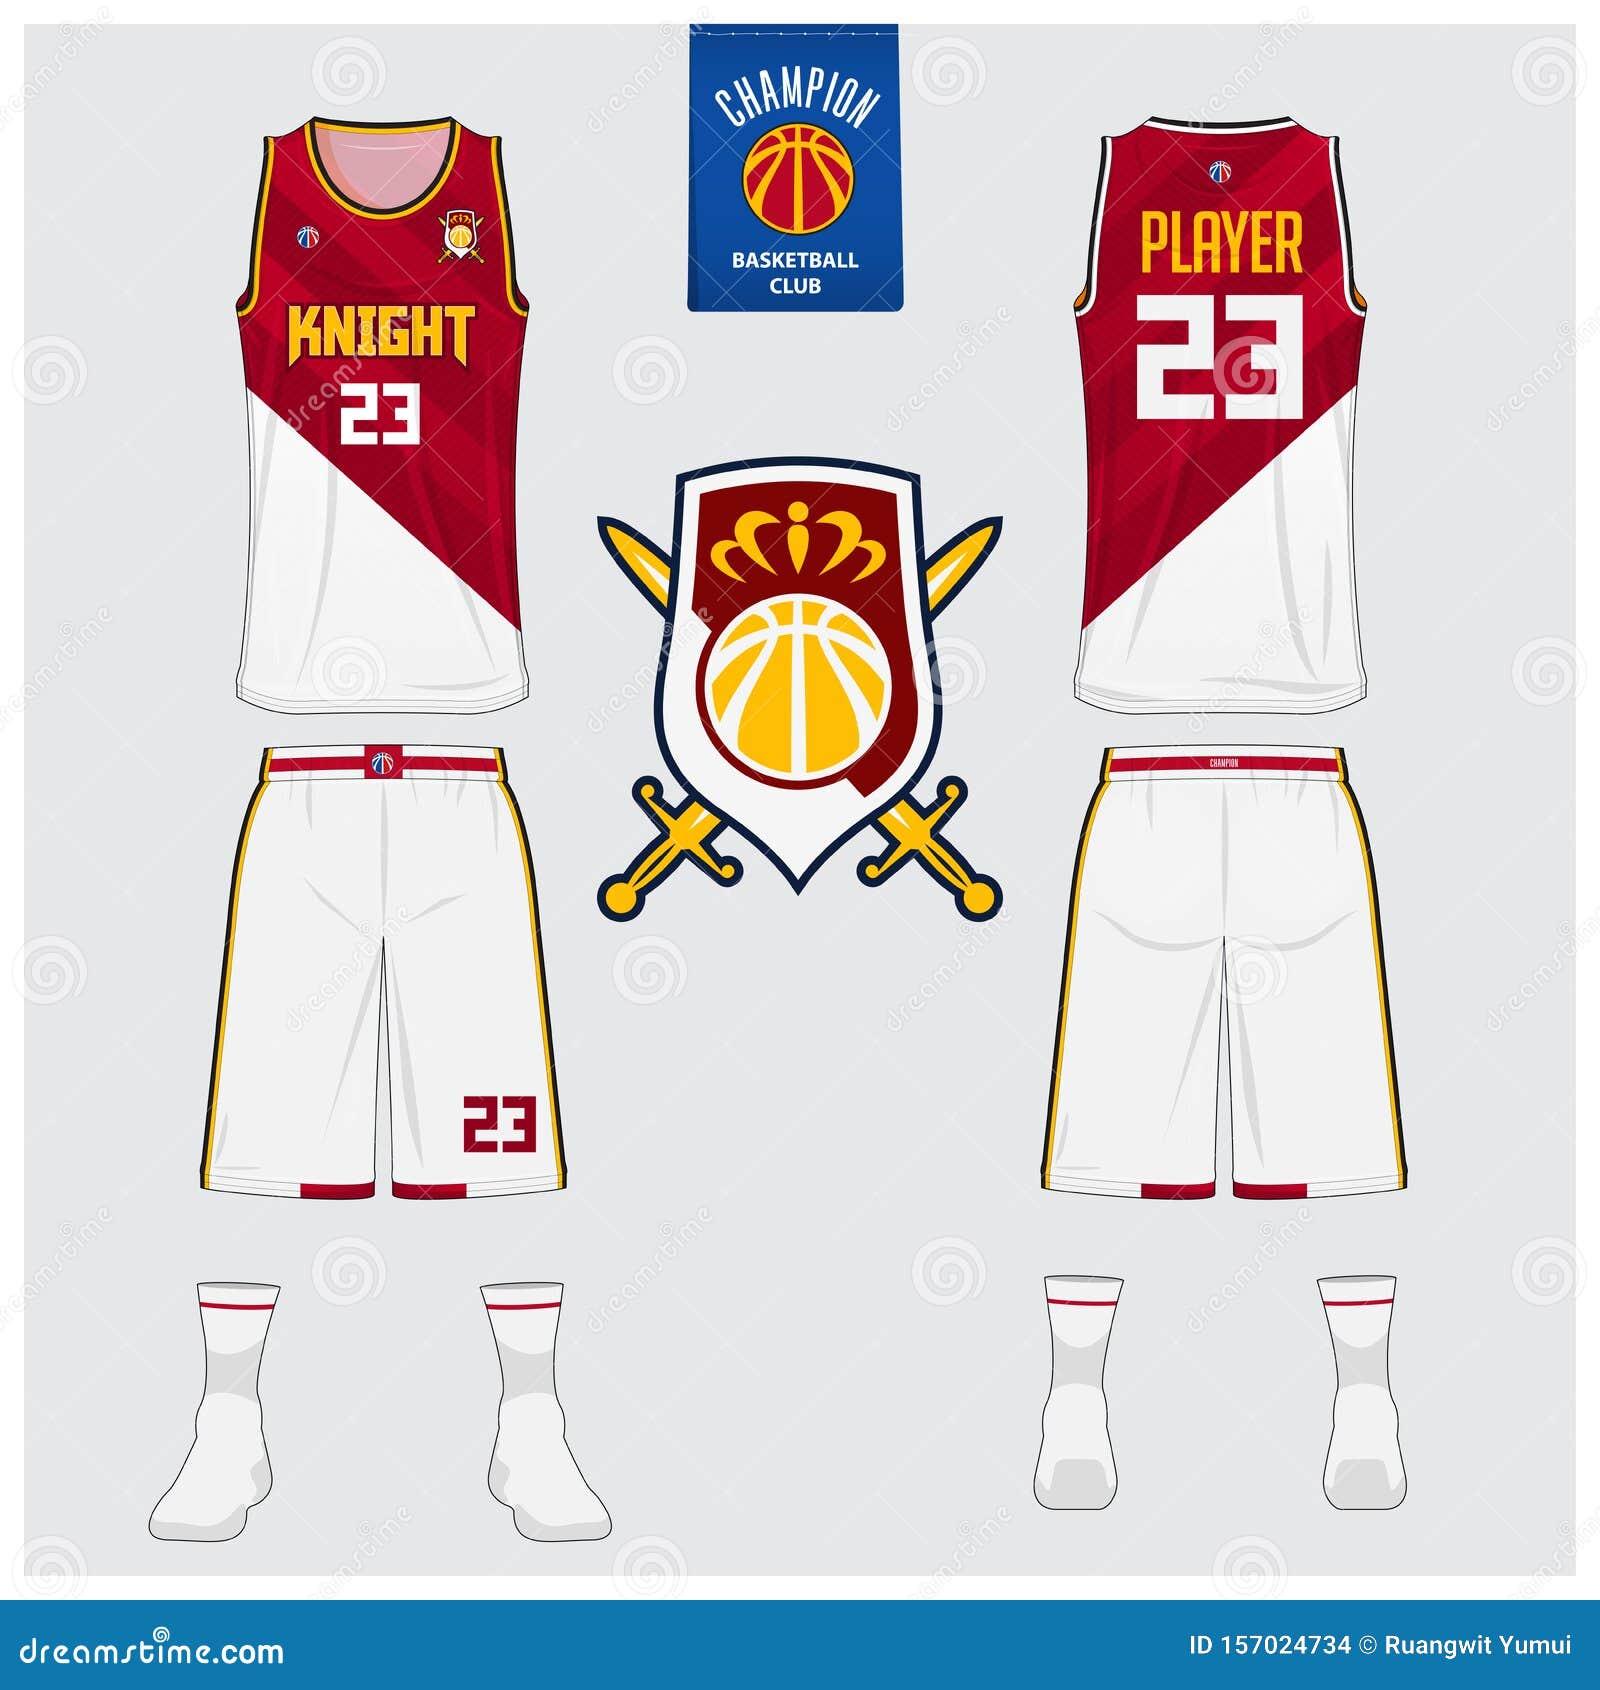 Basketball Uniform Mockup Template Design For Basketball Club Tank Top T Shirt Mockup For Basketball Jersey Stock Vector Illustration Of Side Blank 157024734